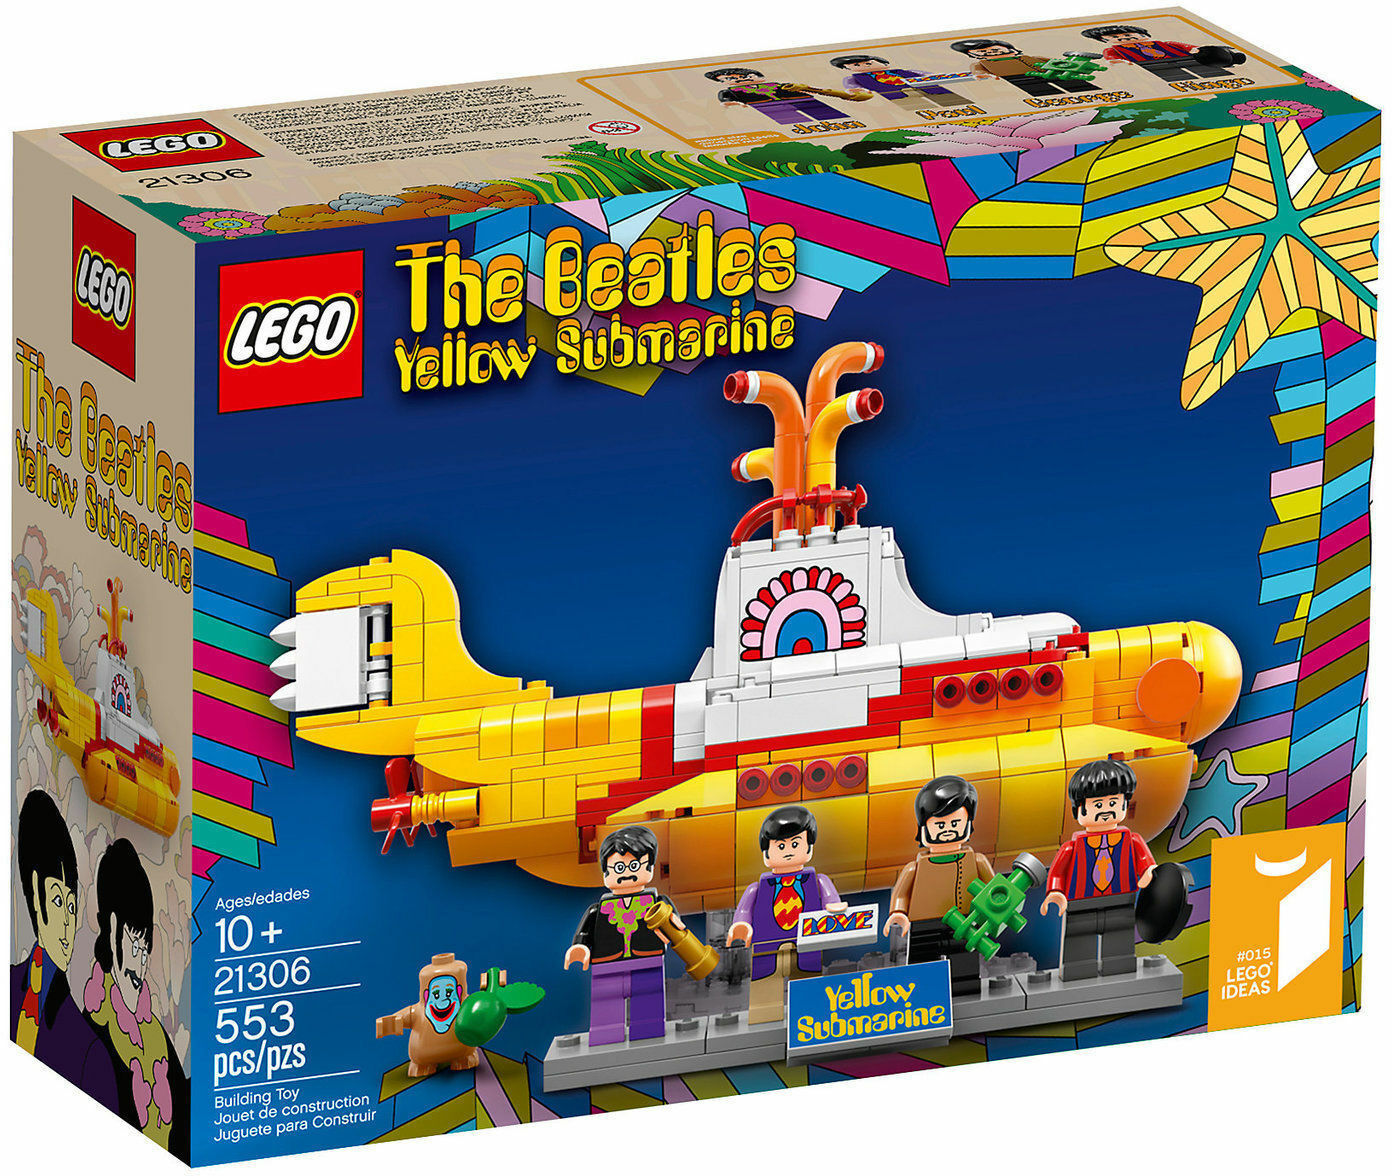 LEGO LEGO LEGO 21306 THE BEATLES Gelb SUBMARINE IDEAS e54608